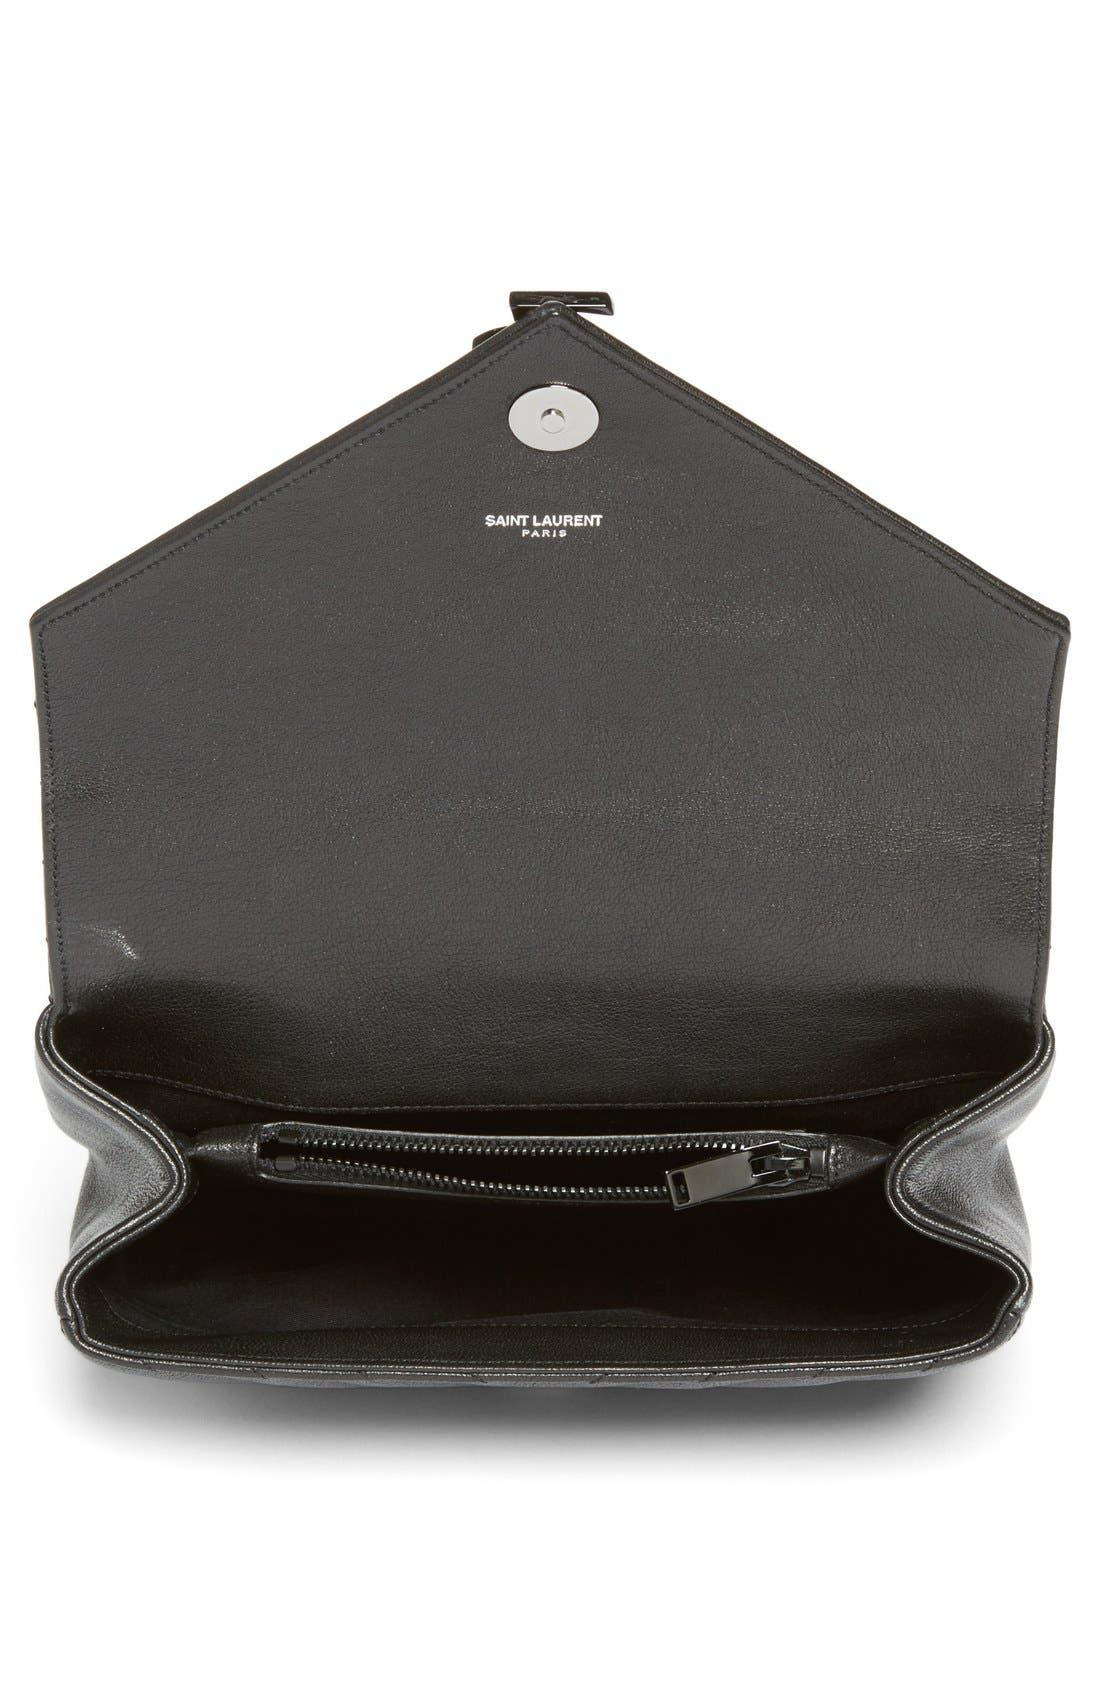 'Medium College' Quilted Leather Shoulder Bag,                             Alternate thumbnail 6, color,                             001